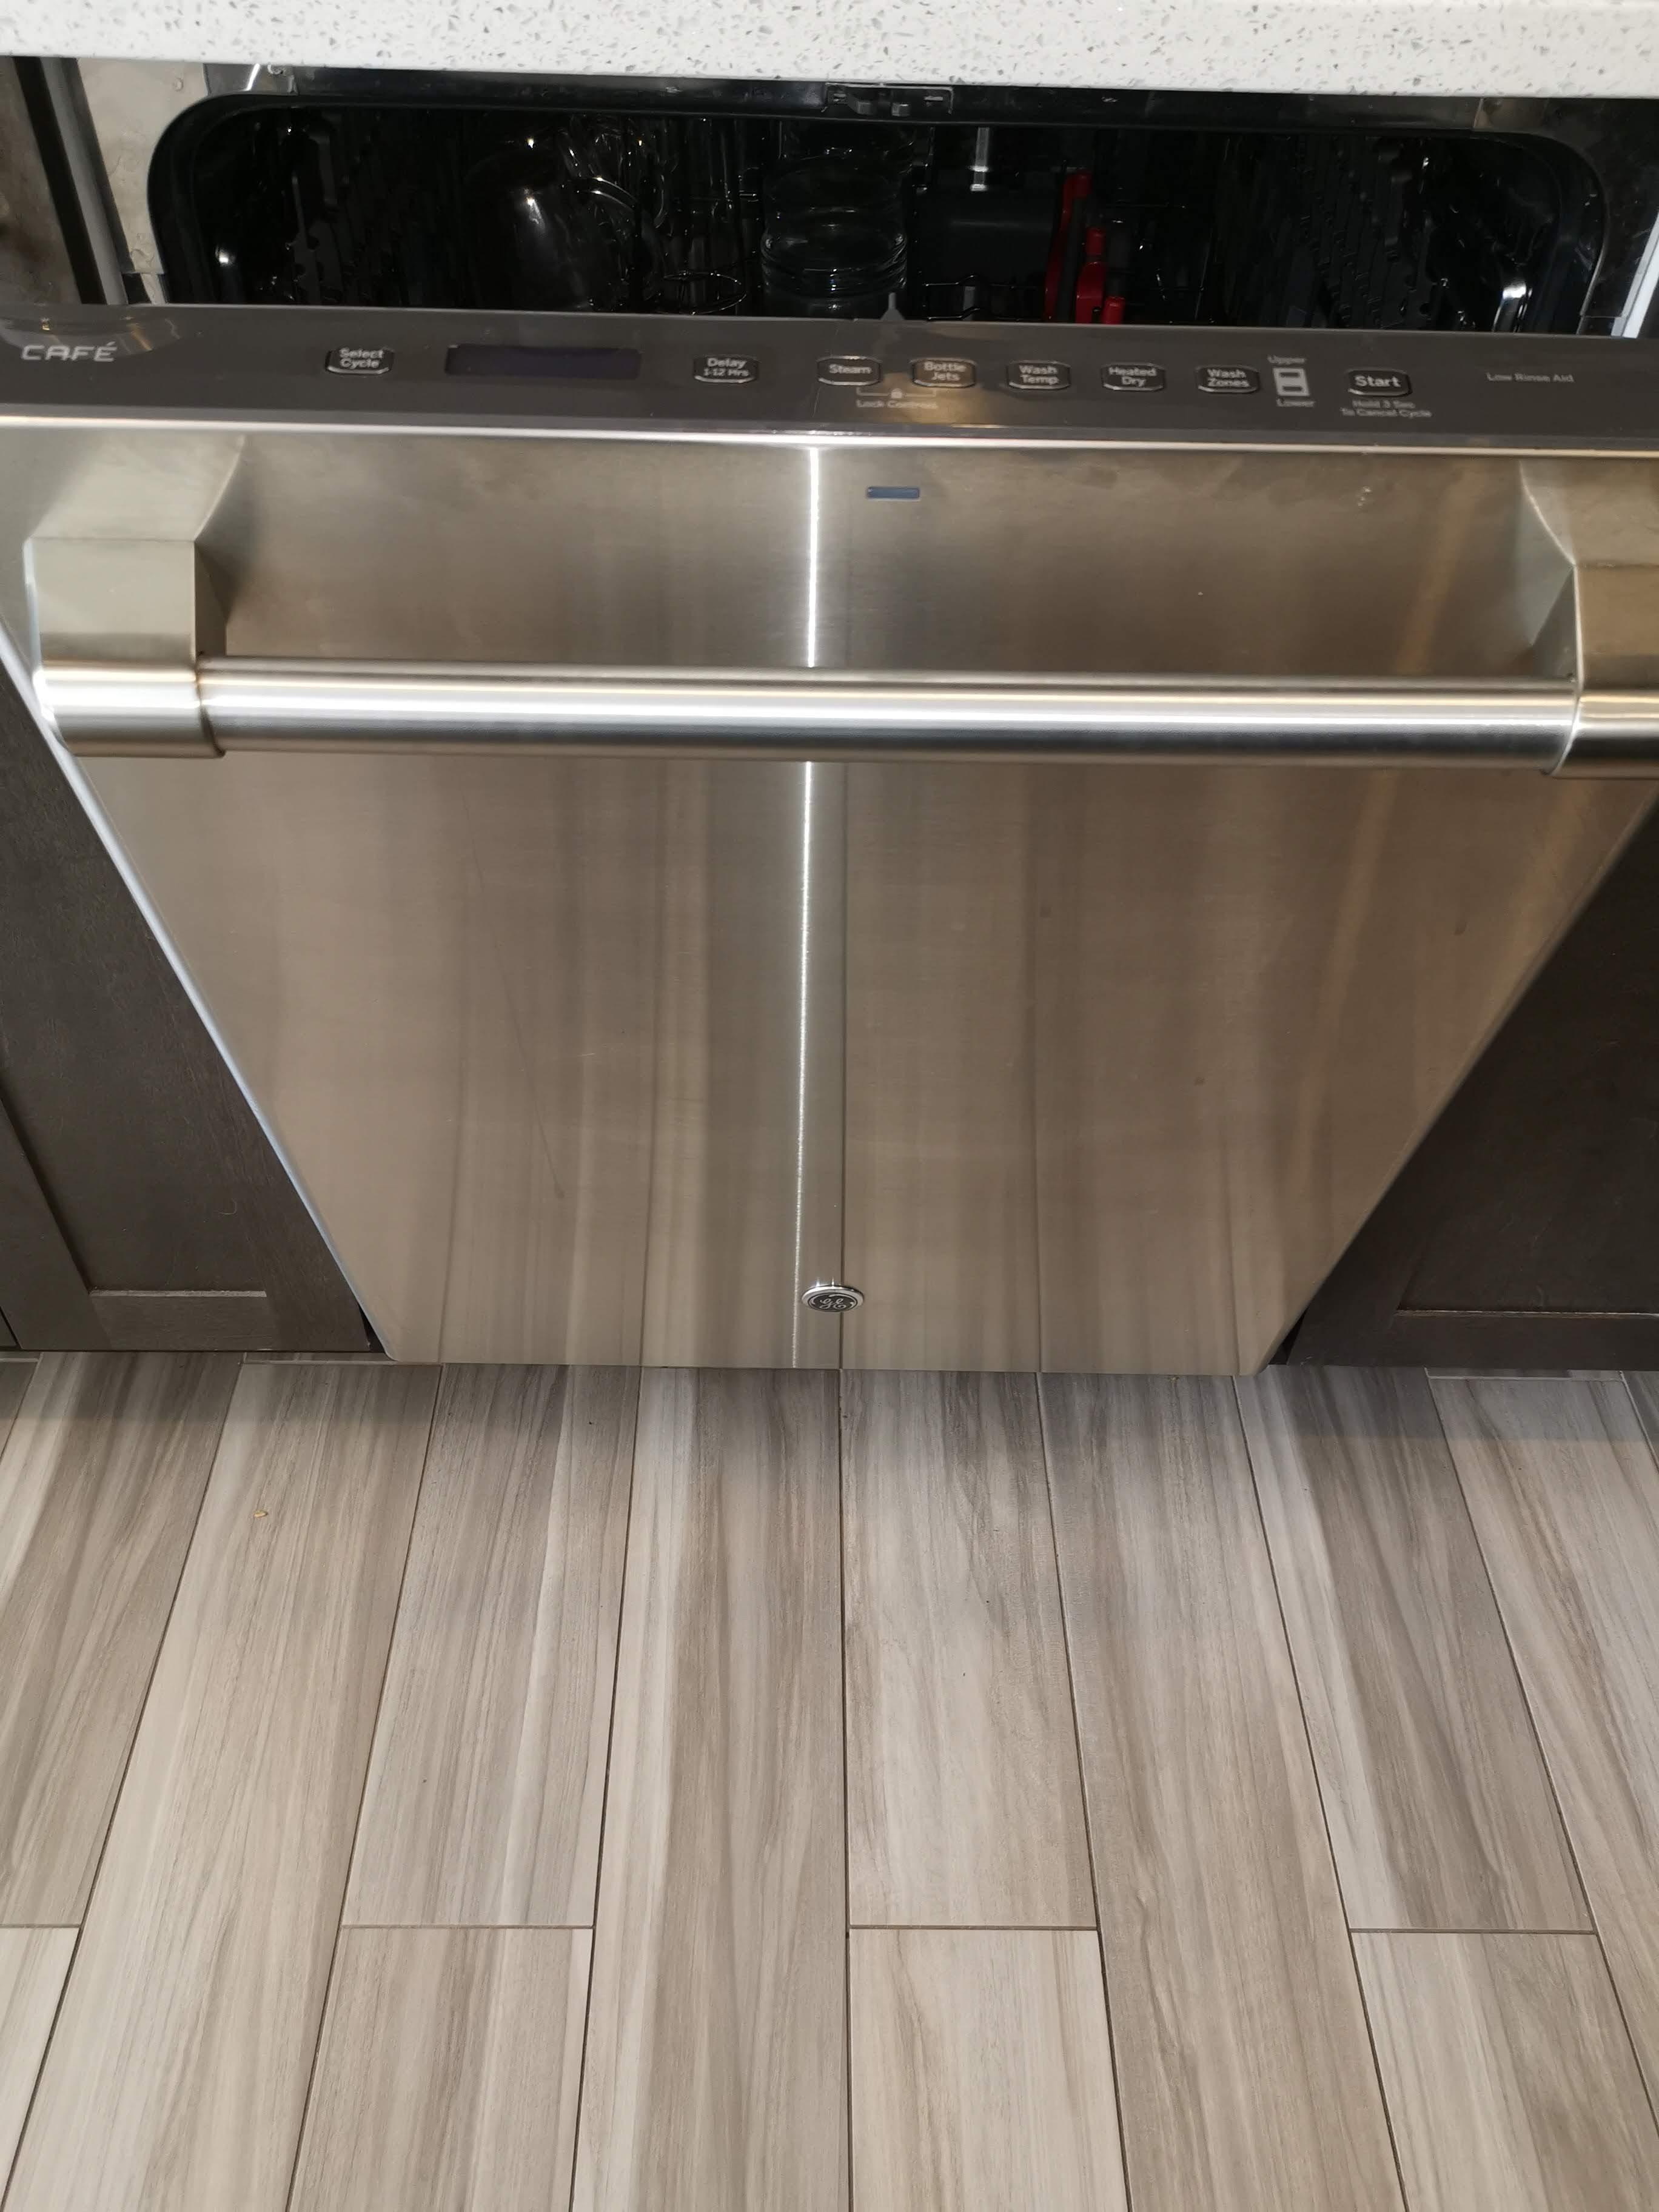 Dishwasher Repair   Home Appliance Repair in Ottawa:1(613